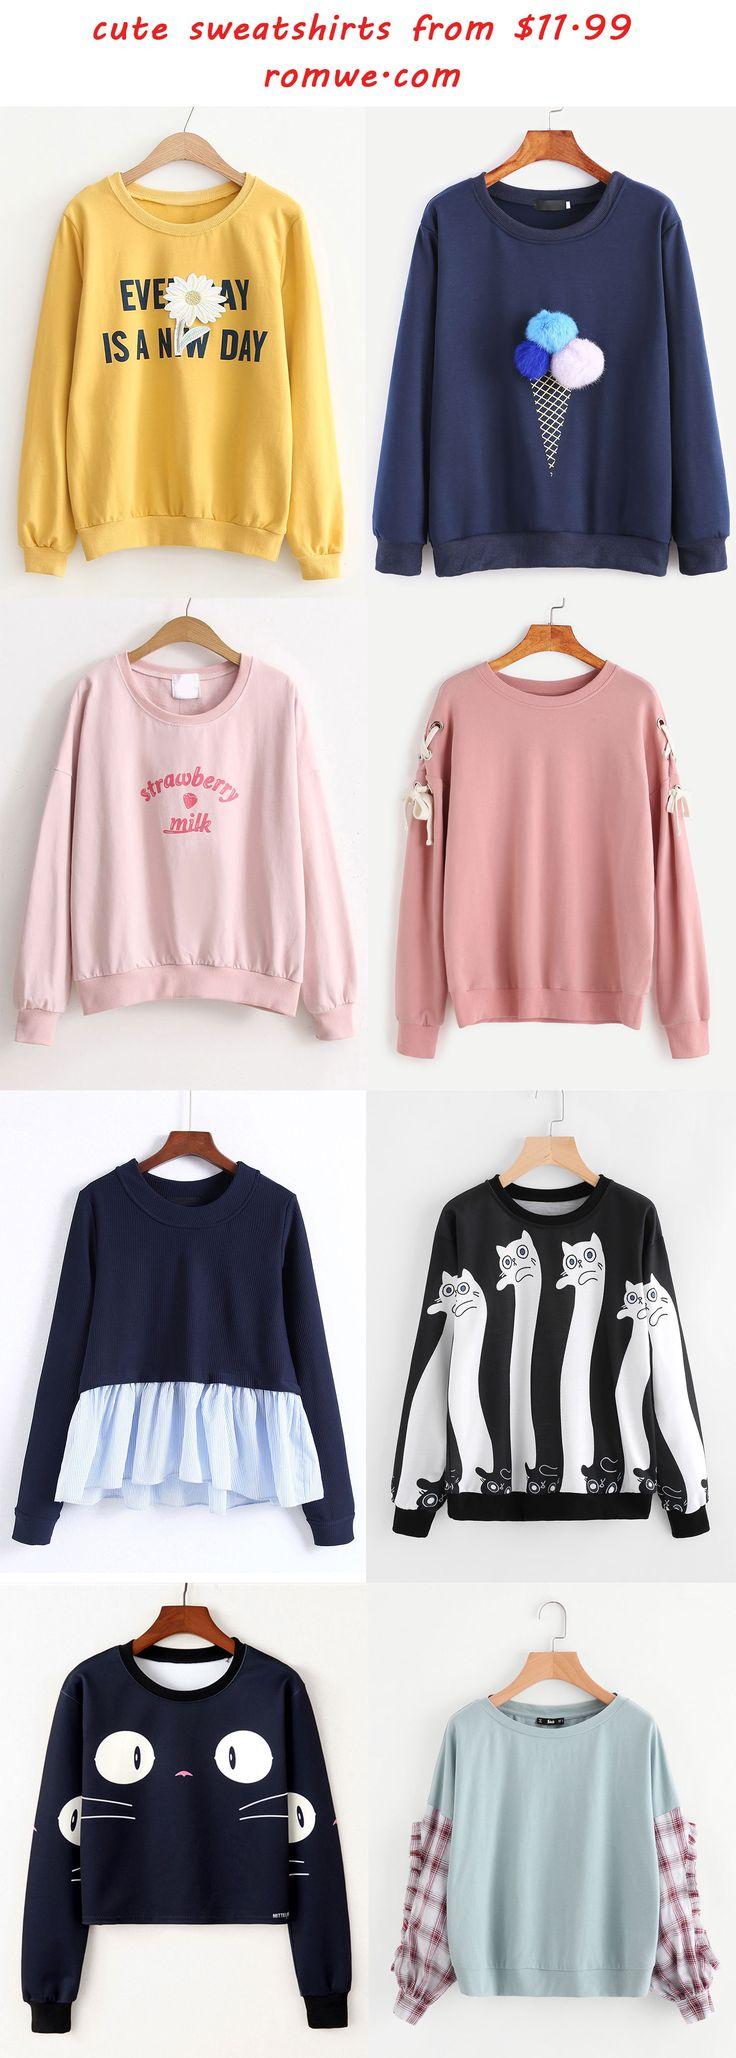 cute sweatshirts - romwe.com